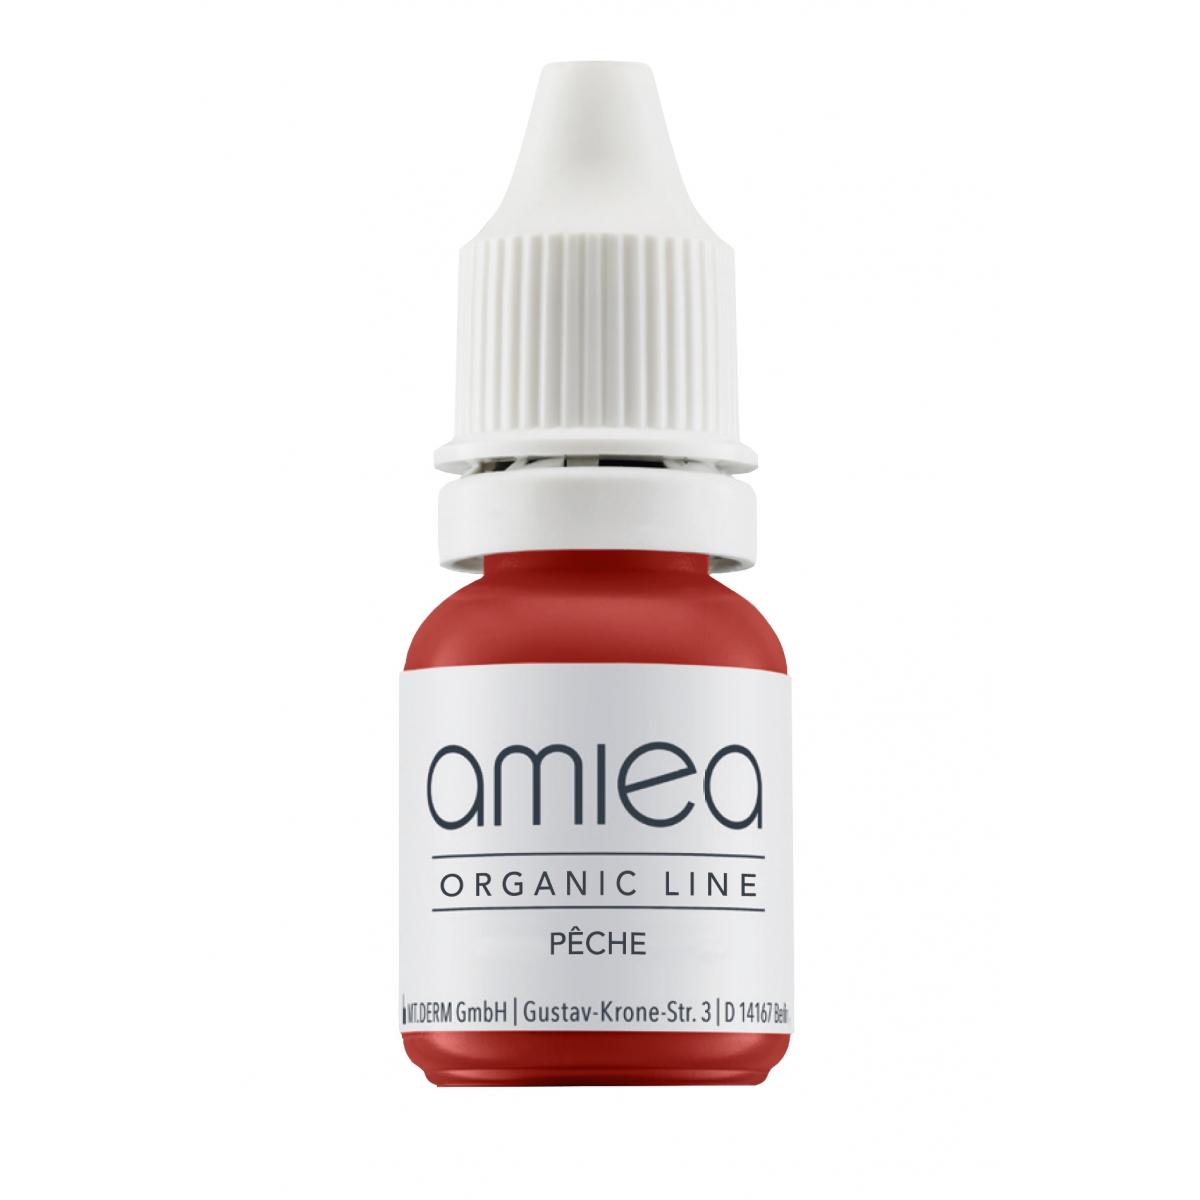 Organicline (10 ml) - PIGMENTS AMIEA ORGANICLINE PECHE, Flacon 10 ml